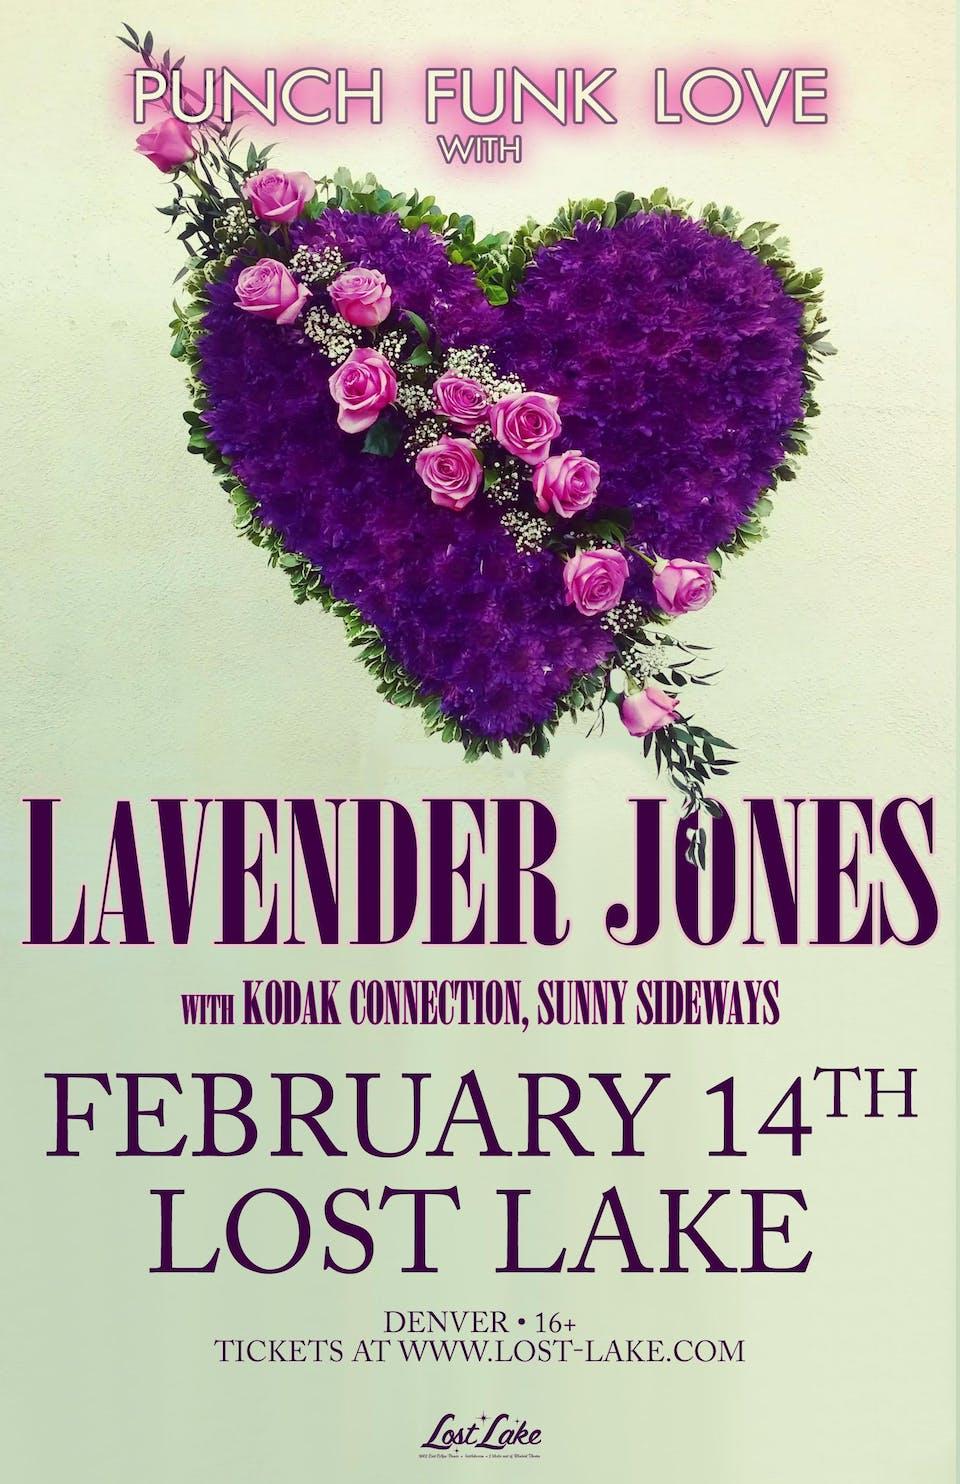 Lavender Jones